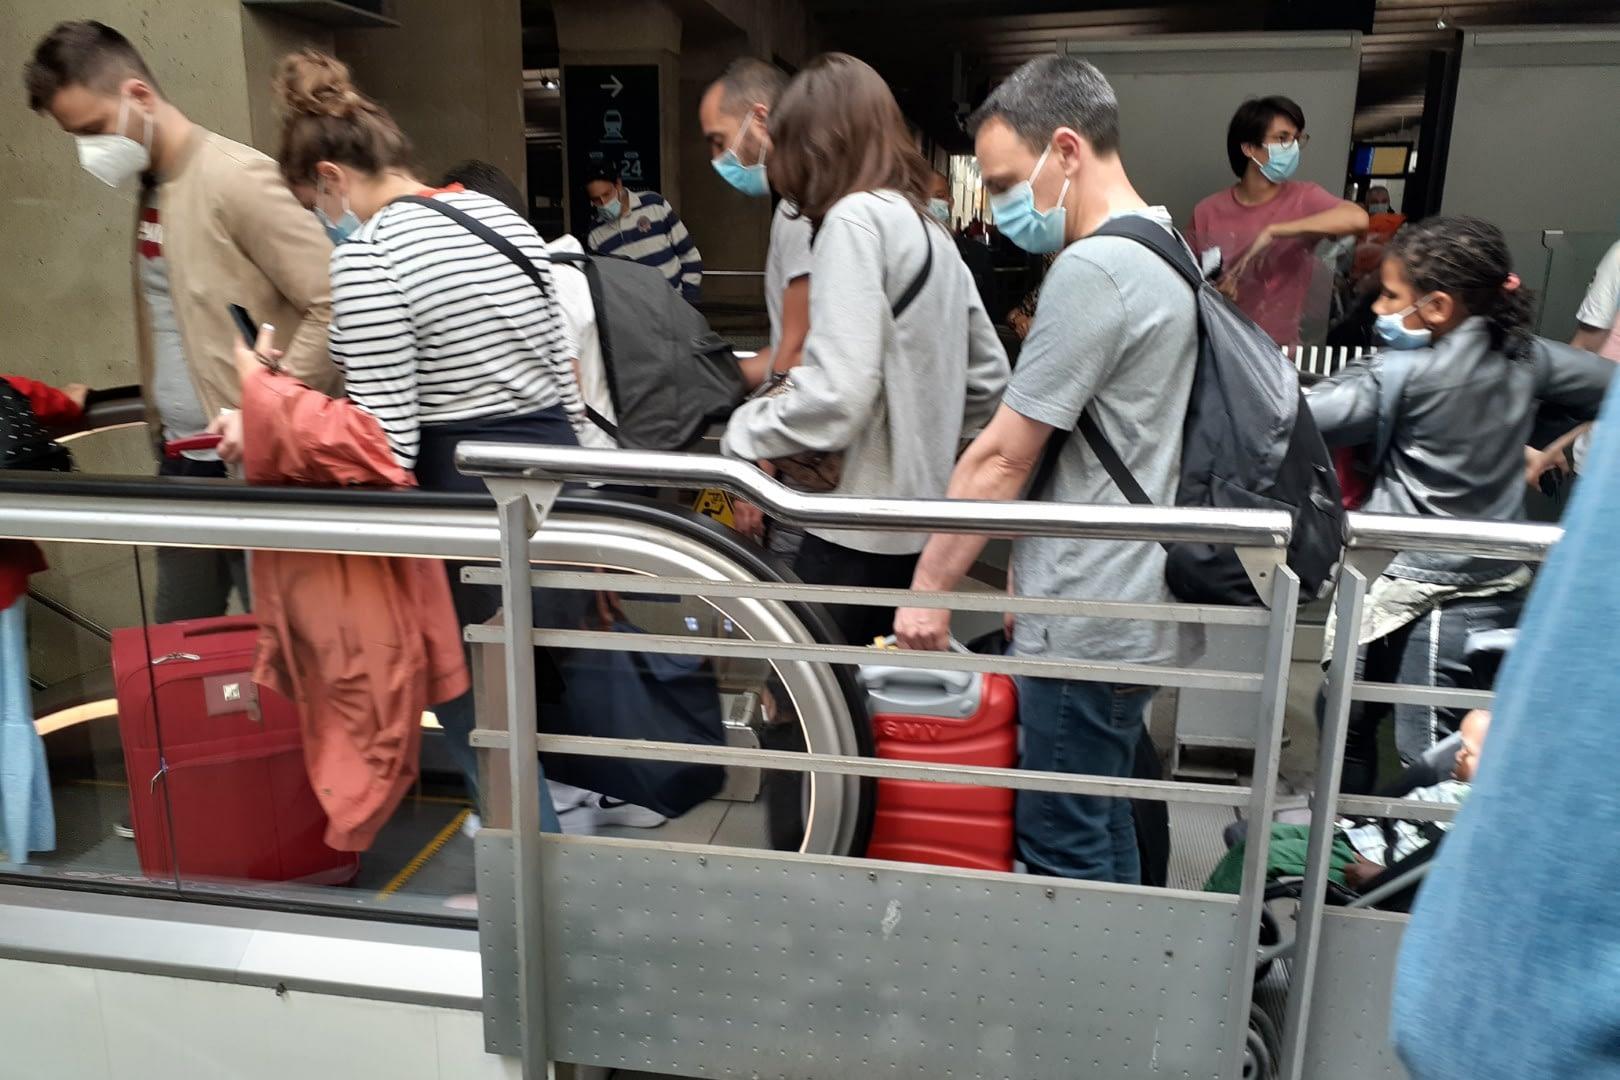 Gare Montparnasse, Hall 2, Paris